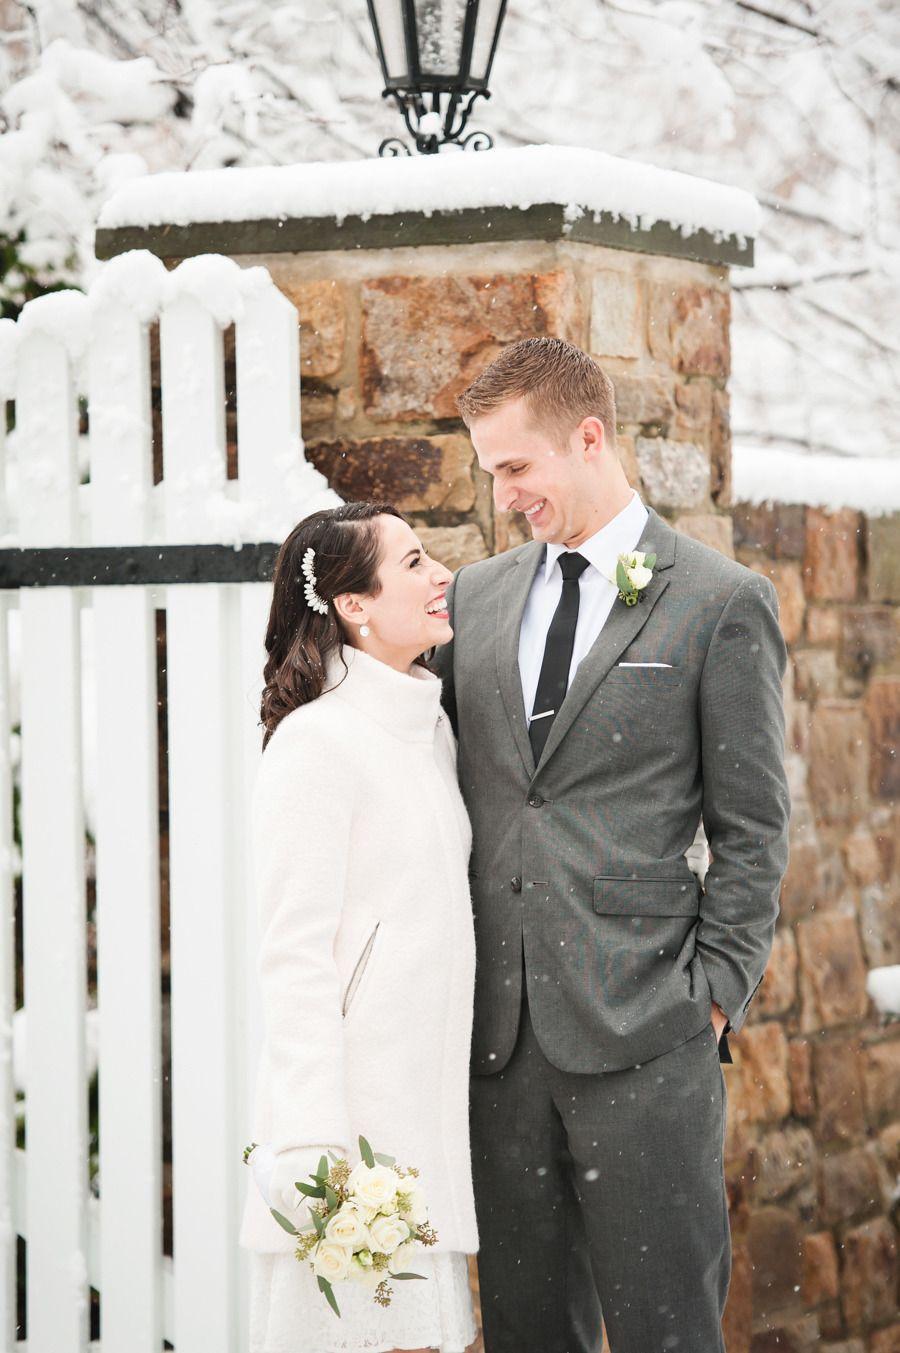 Intimate Winter Wedding At City Hall Courthouse Wedding Dress Winter Wedding Dress Courthouse Wedding